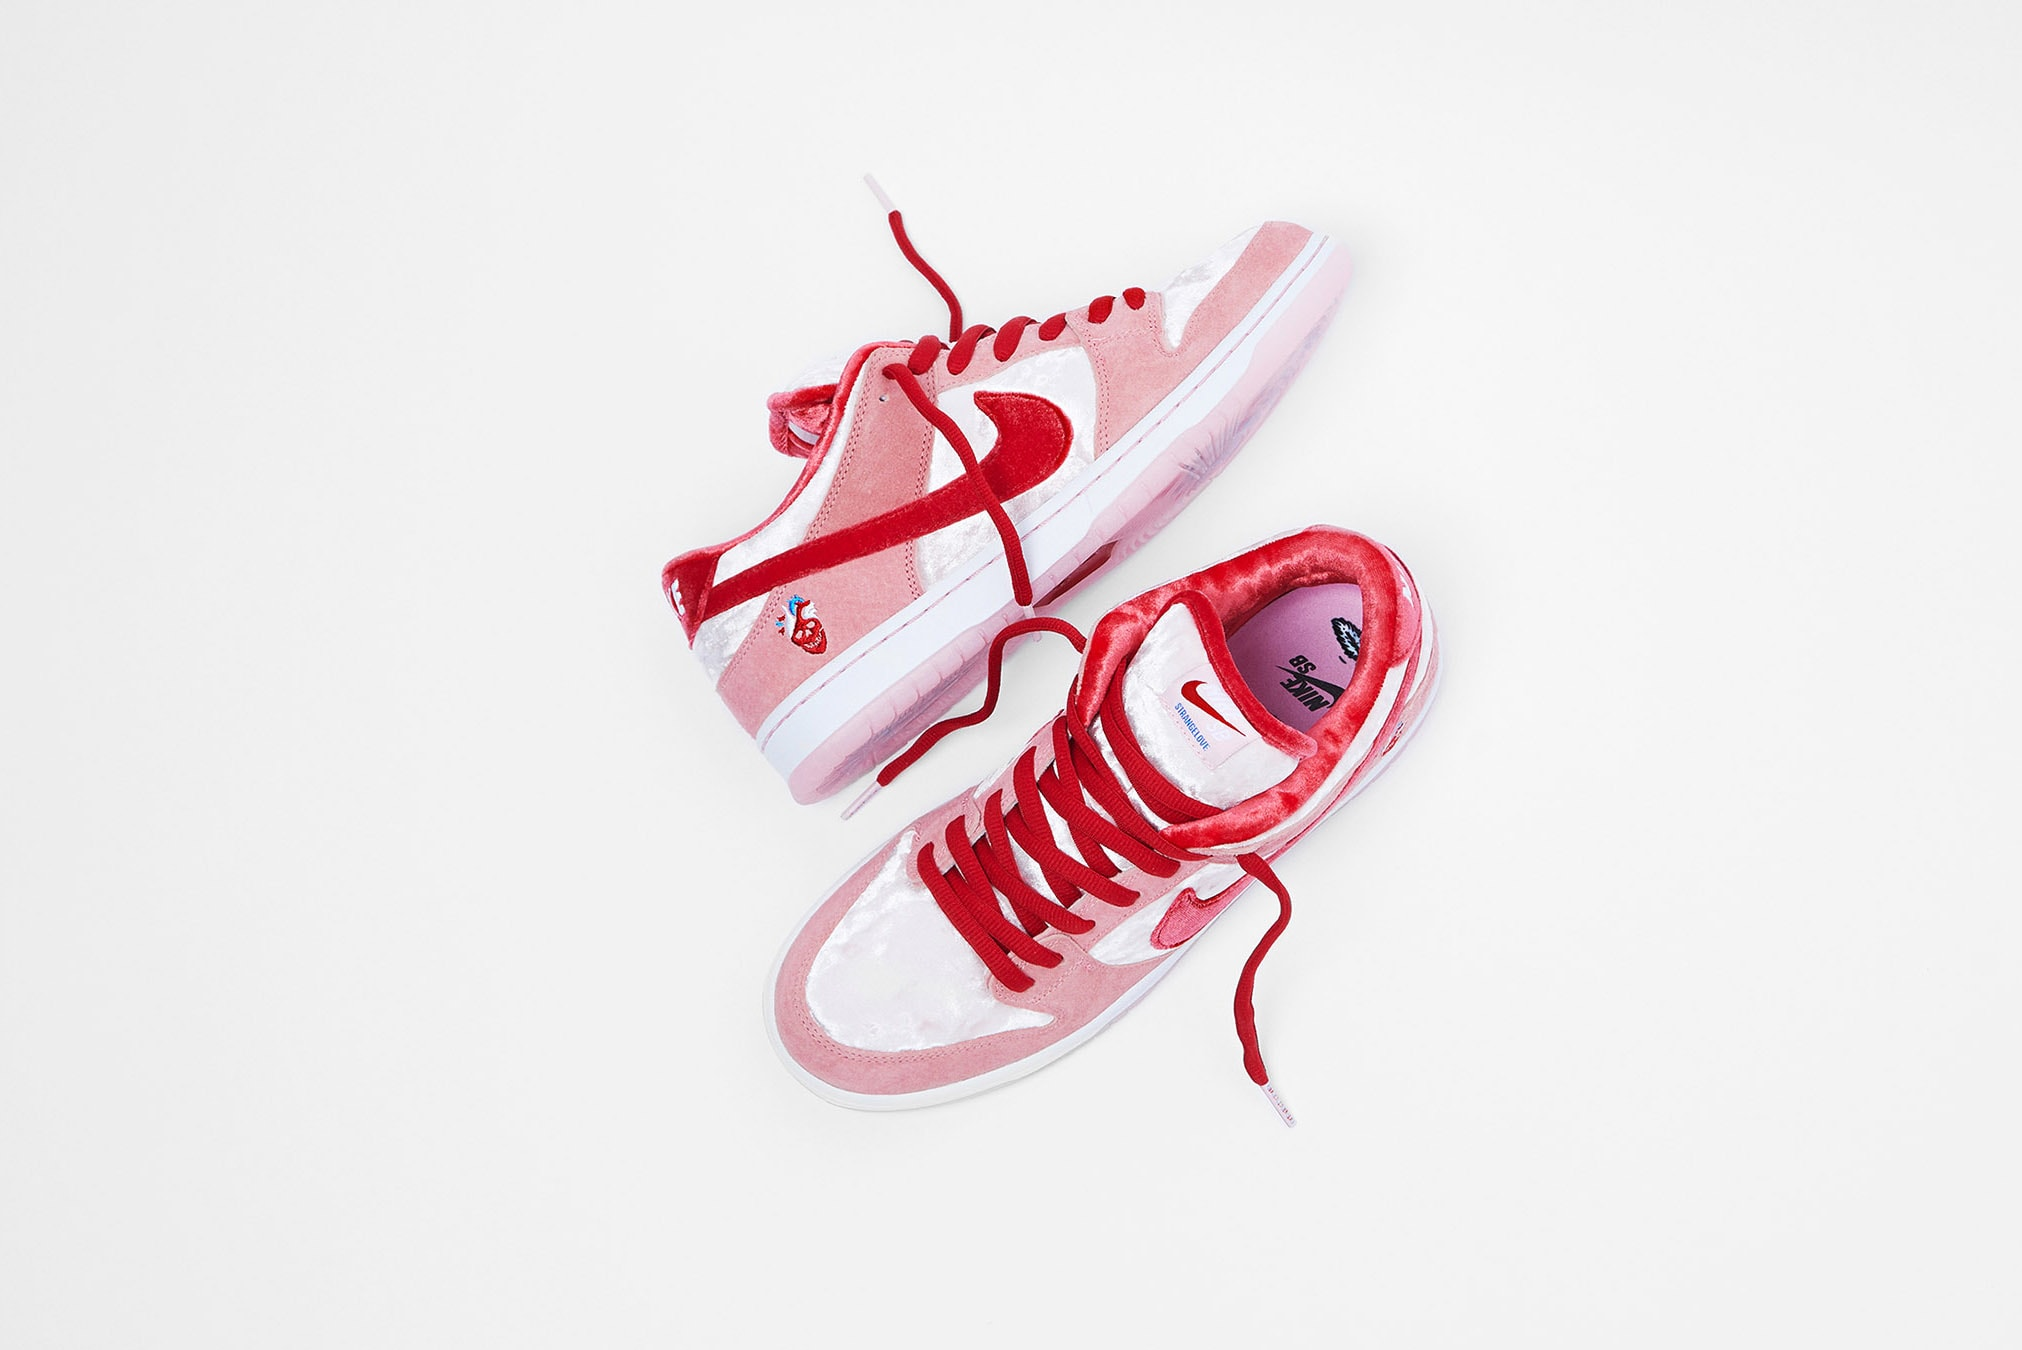 Nike SB x Strangelove Dunk Low Pro - CT2552-800